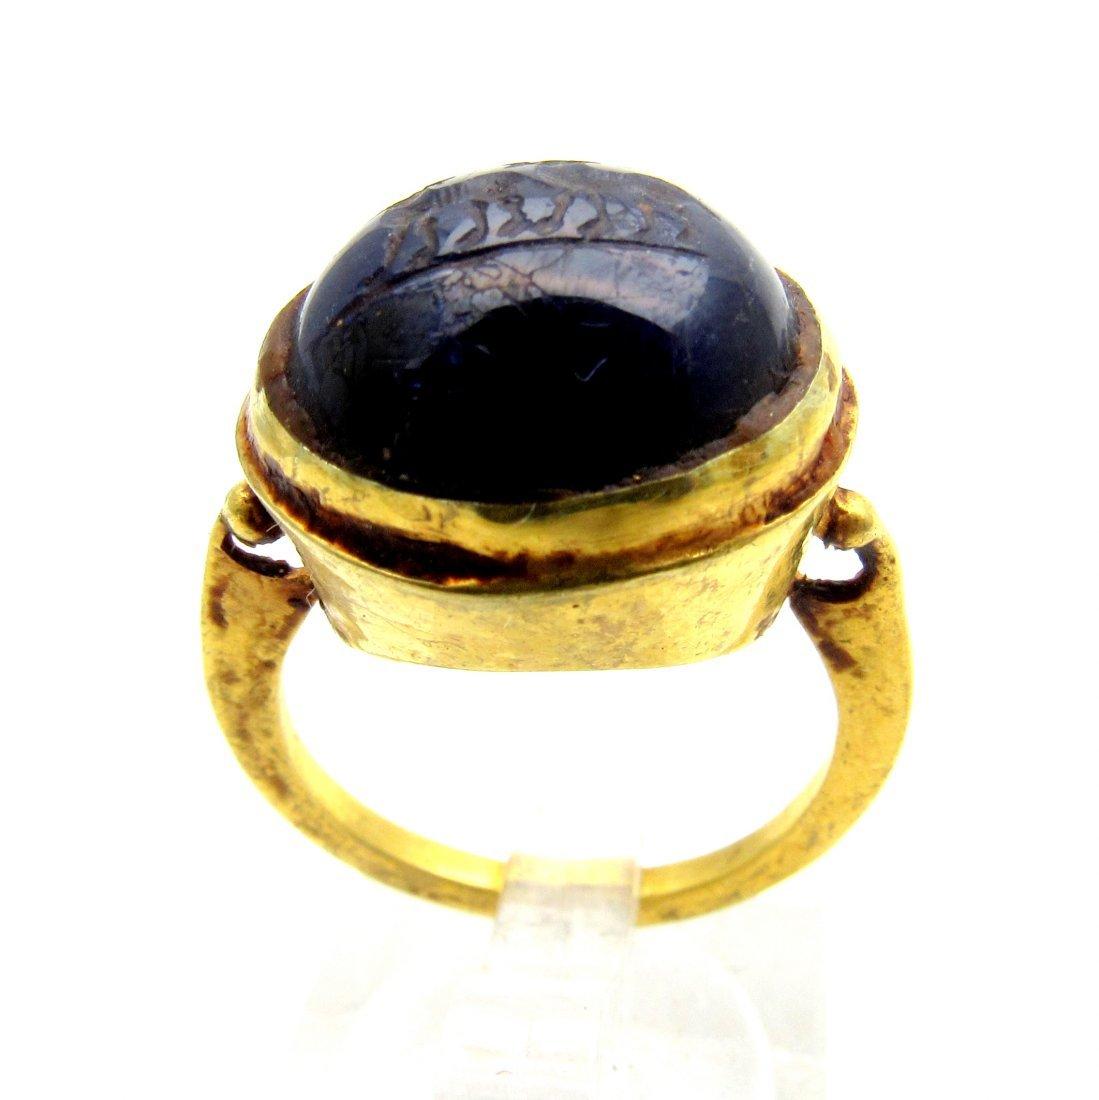 Persian Medieval Gold Ring with Lapis Lazuli Intaglio - 2